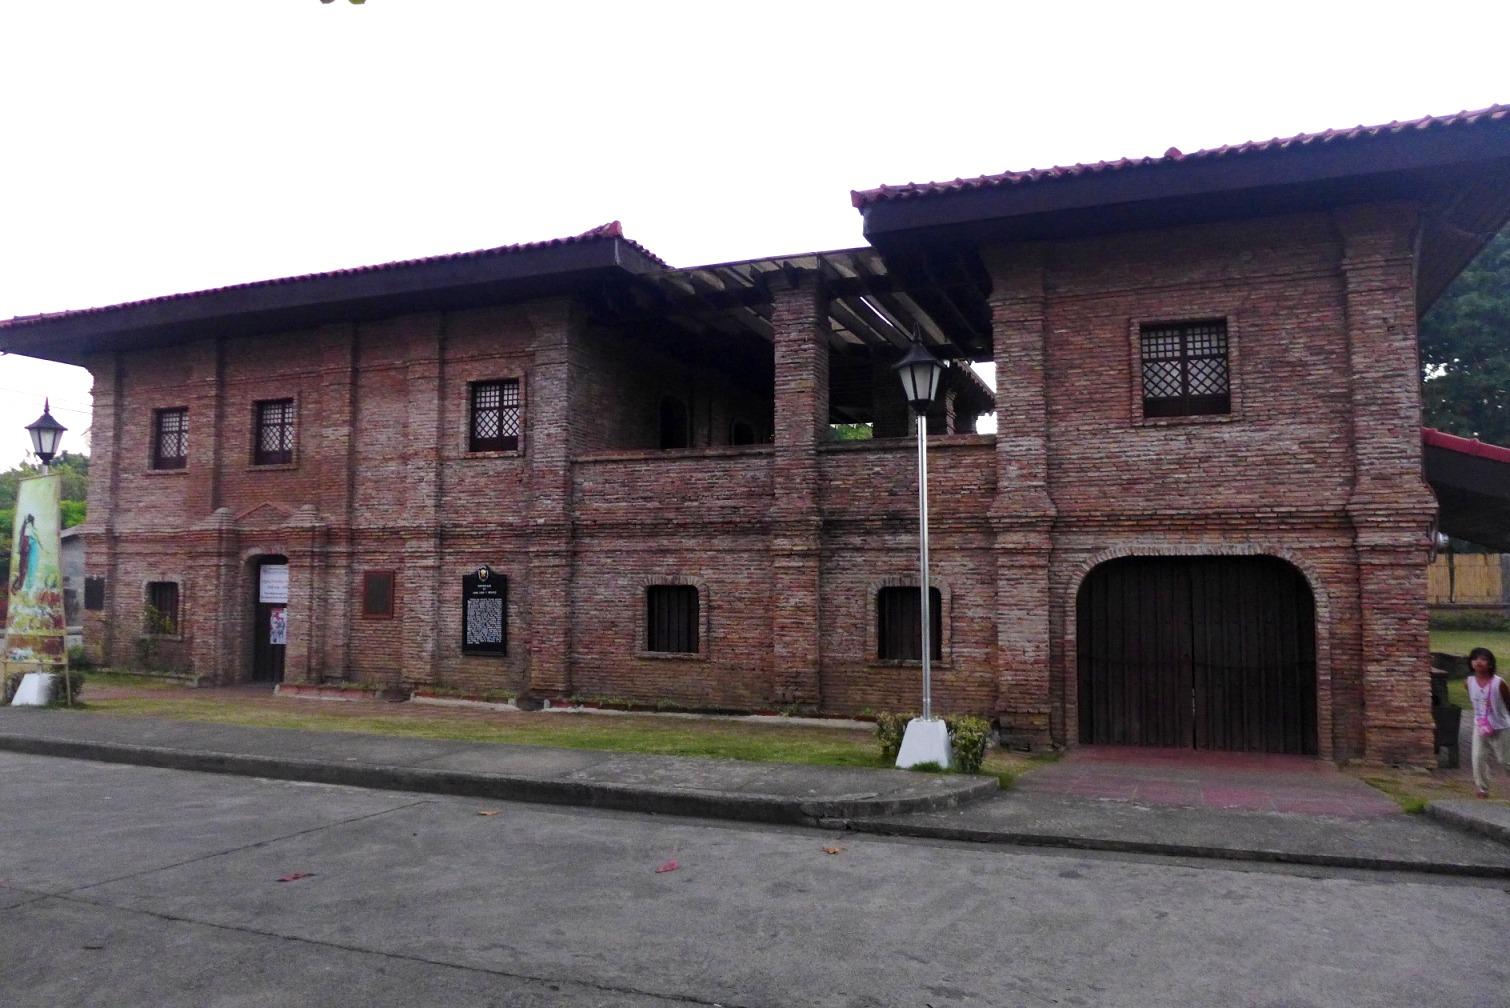 What to do in Ilocos Norte, Ilocos Norte travel, Paoay, Batac, Badoc, Ilocos Norte